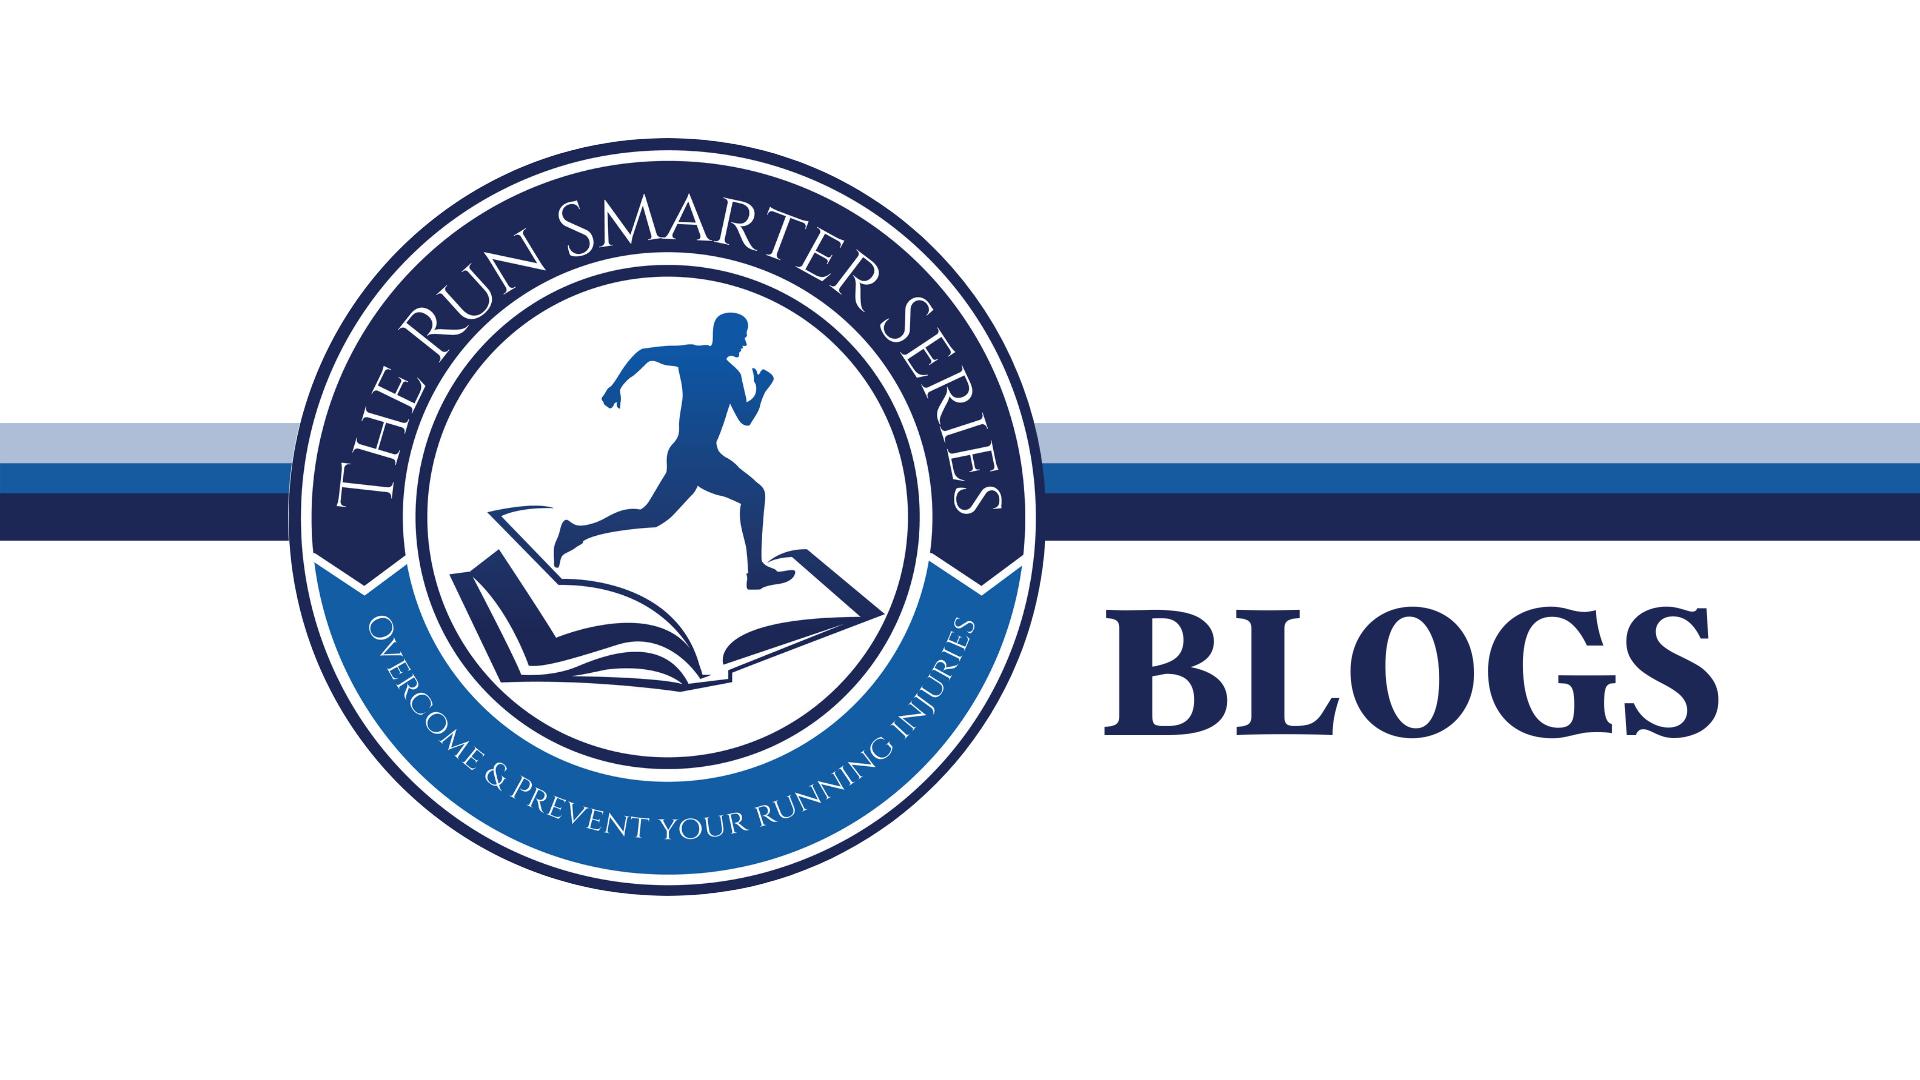 Blog – The Run Smarter Series